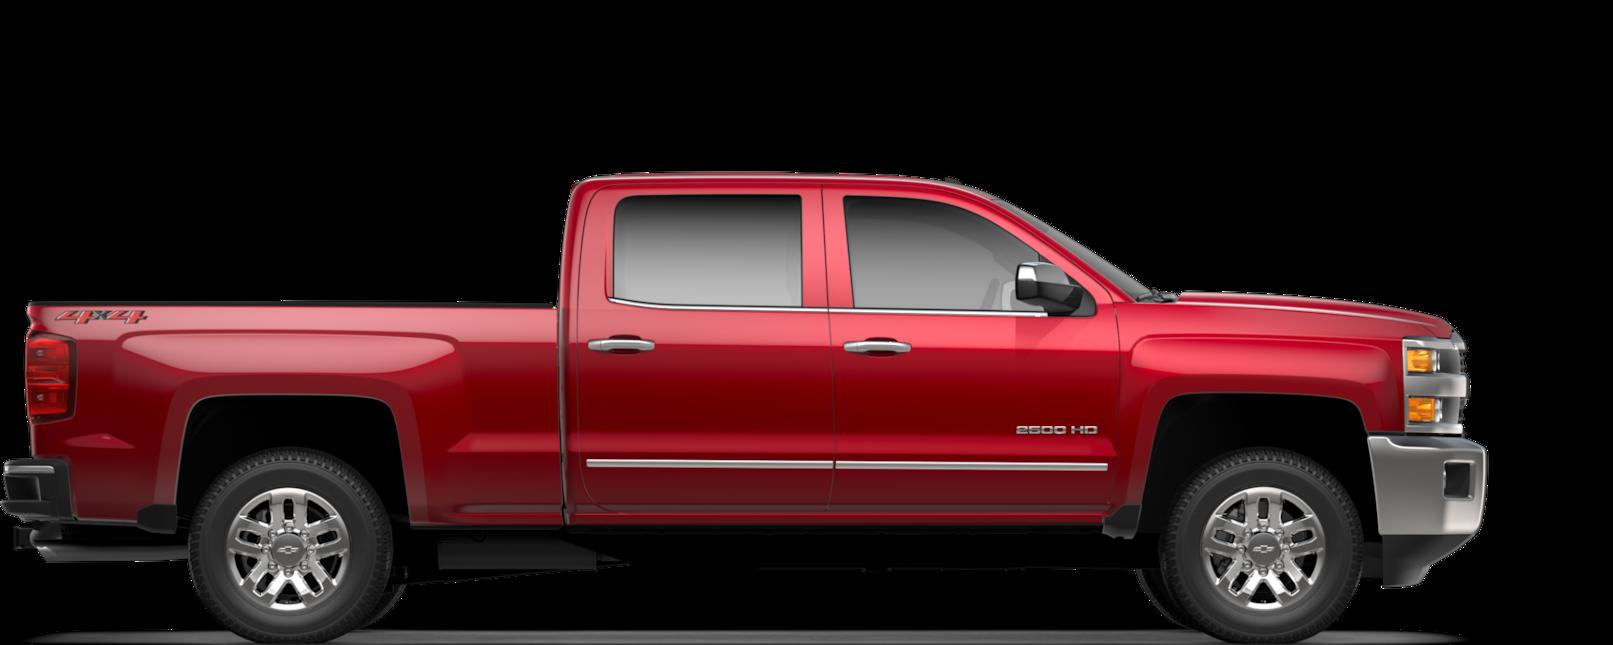 2018 Silverado 2500 3500 Heavy Duty Trucks Chevrolet